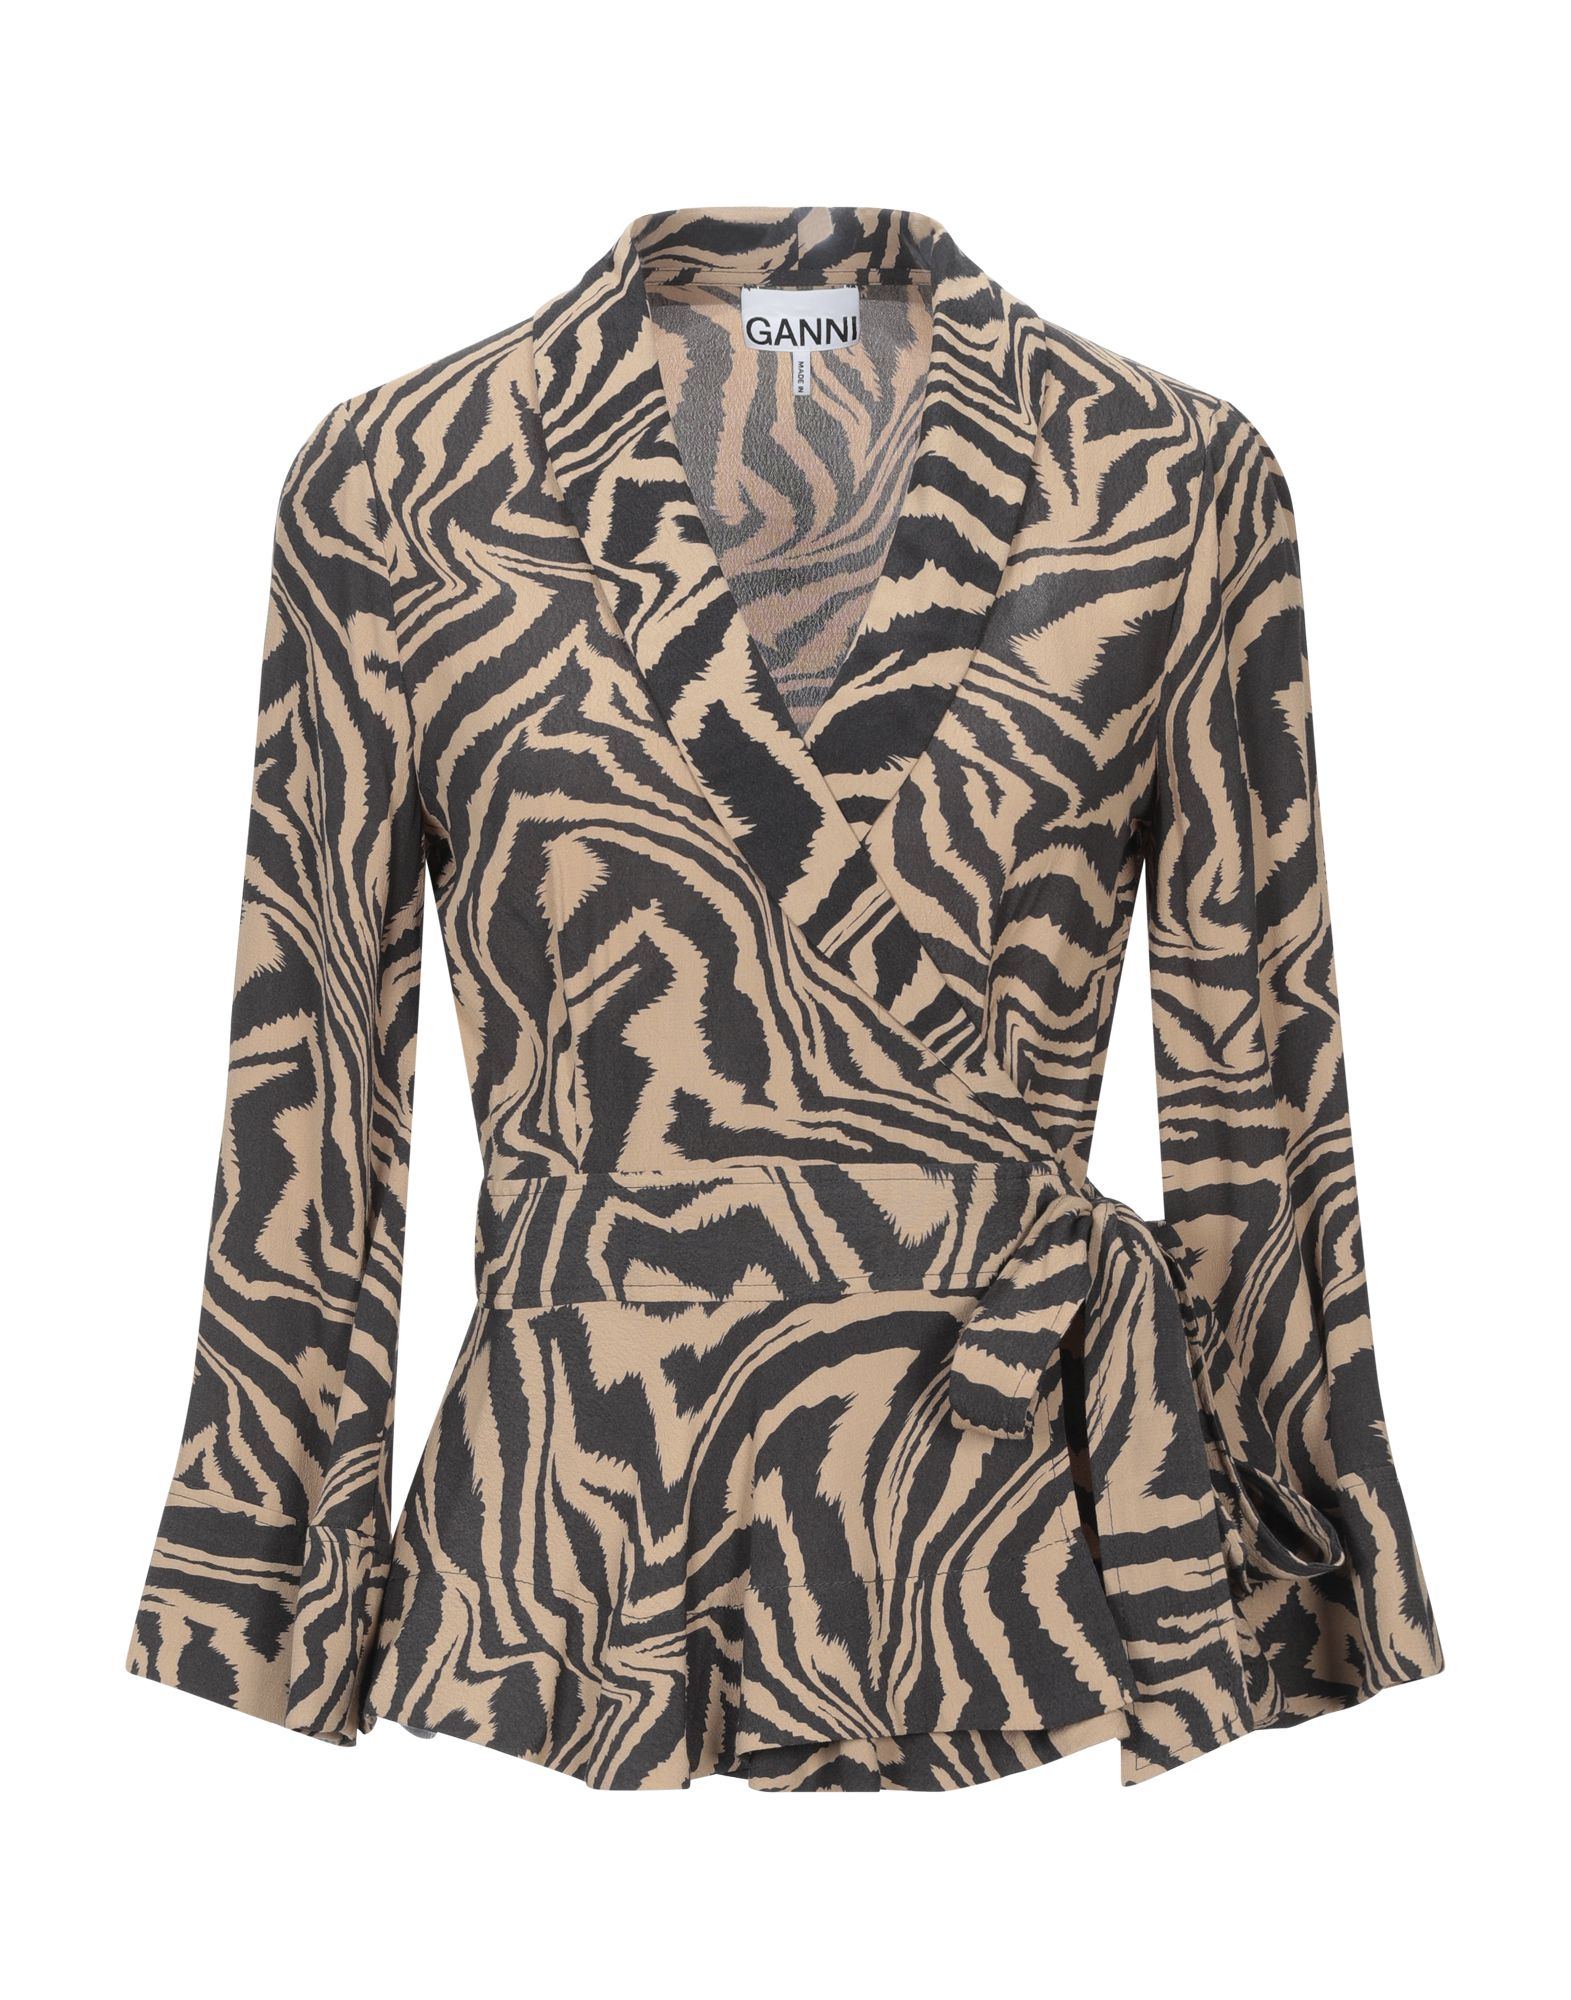 GANNI Suit jackets. plain weave, no appliqués, zebra stripes, lapel collar, long sleeves, single-breasted, no pockets, self-tie wrap closure, unlined. 100% Viscose